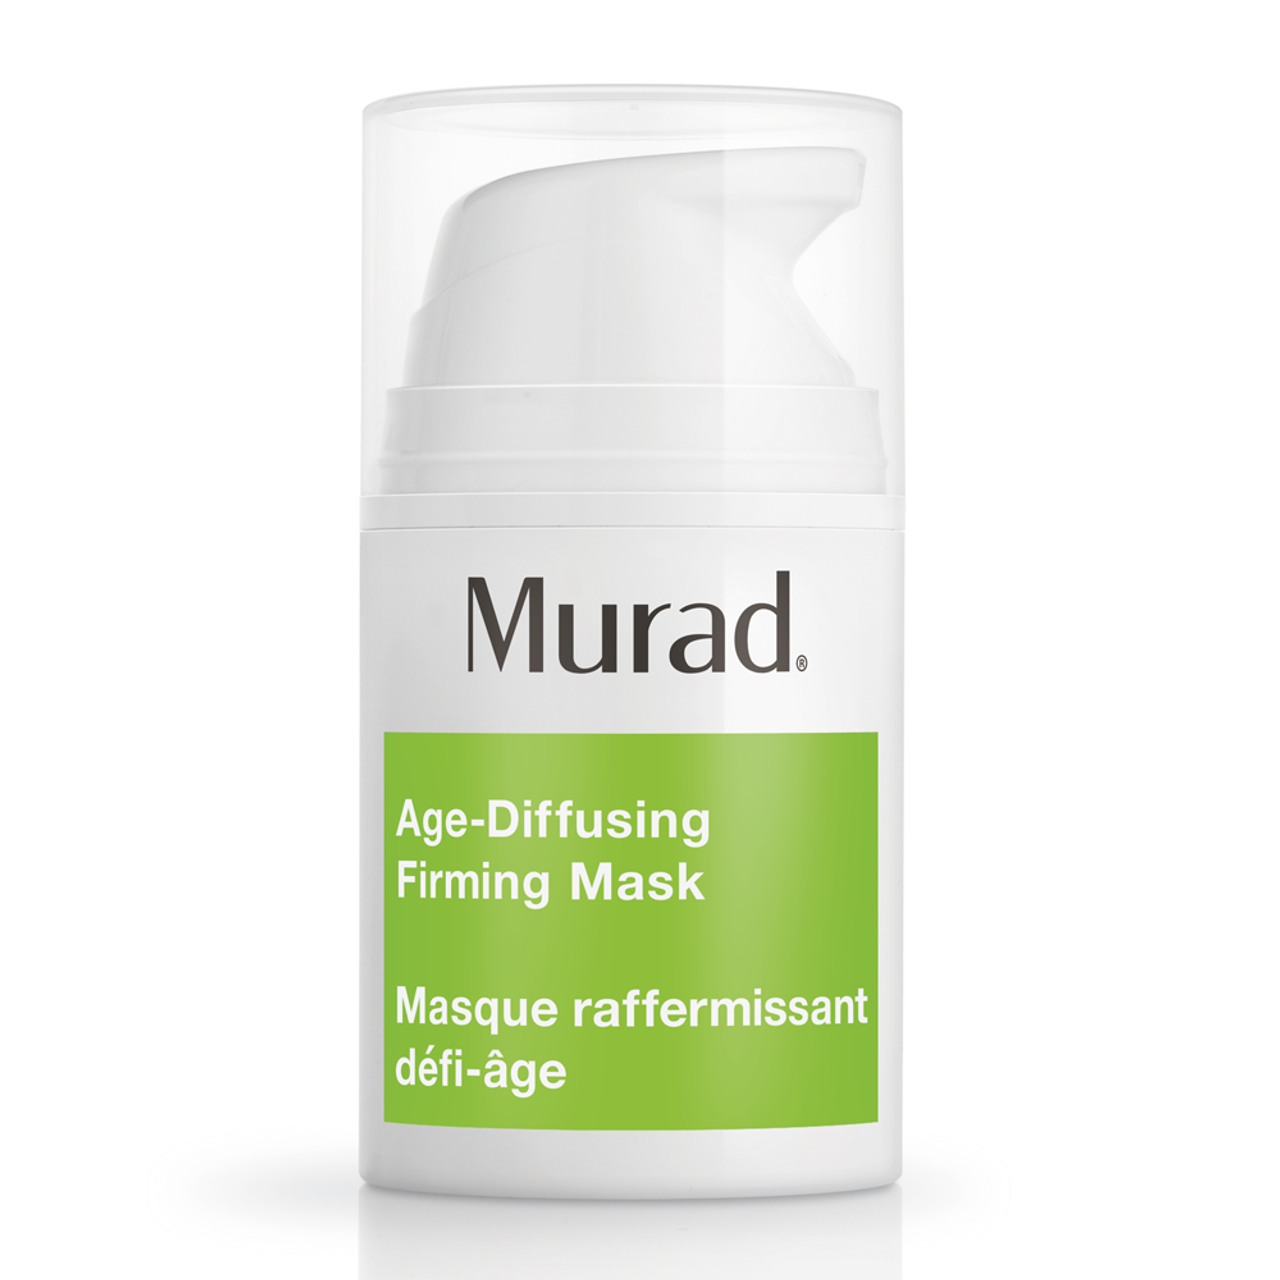 Murad Resurgence™ Age-Diffusing Firming Mask